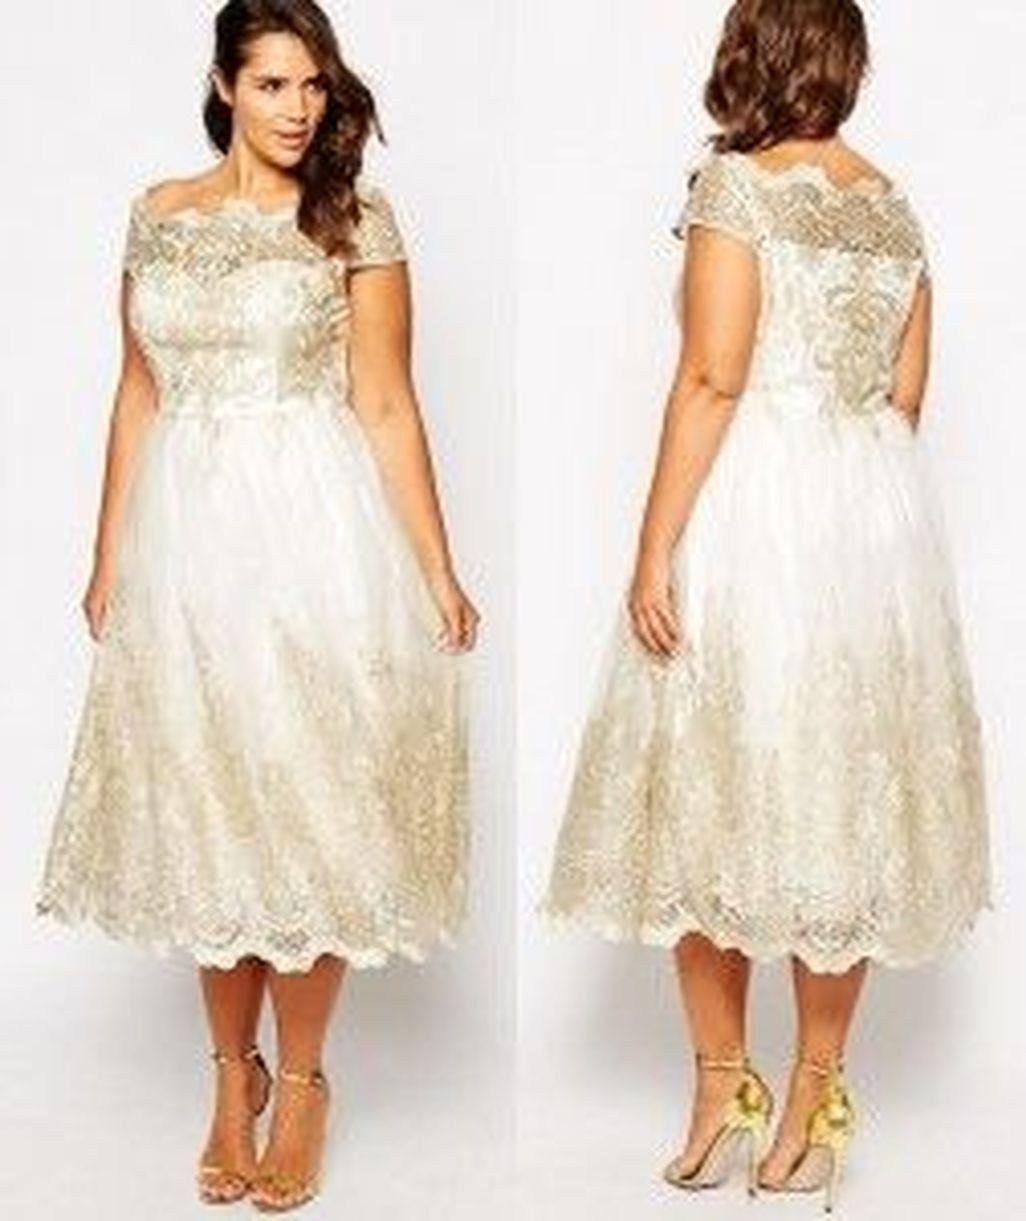 Stylish Plus Size Wedding Dresses Inspirations Ideas 39 Lace Wedding Dress With Sleeves Short Wedding Dress Wedding Dress Inspiration [ 1221 x 1026 Pixel ]